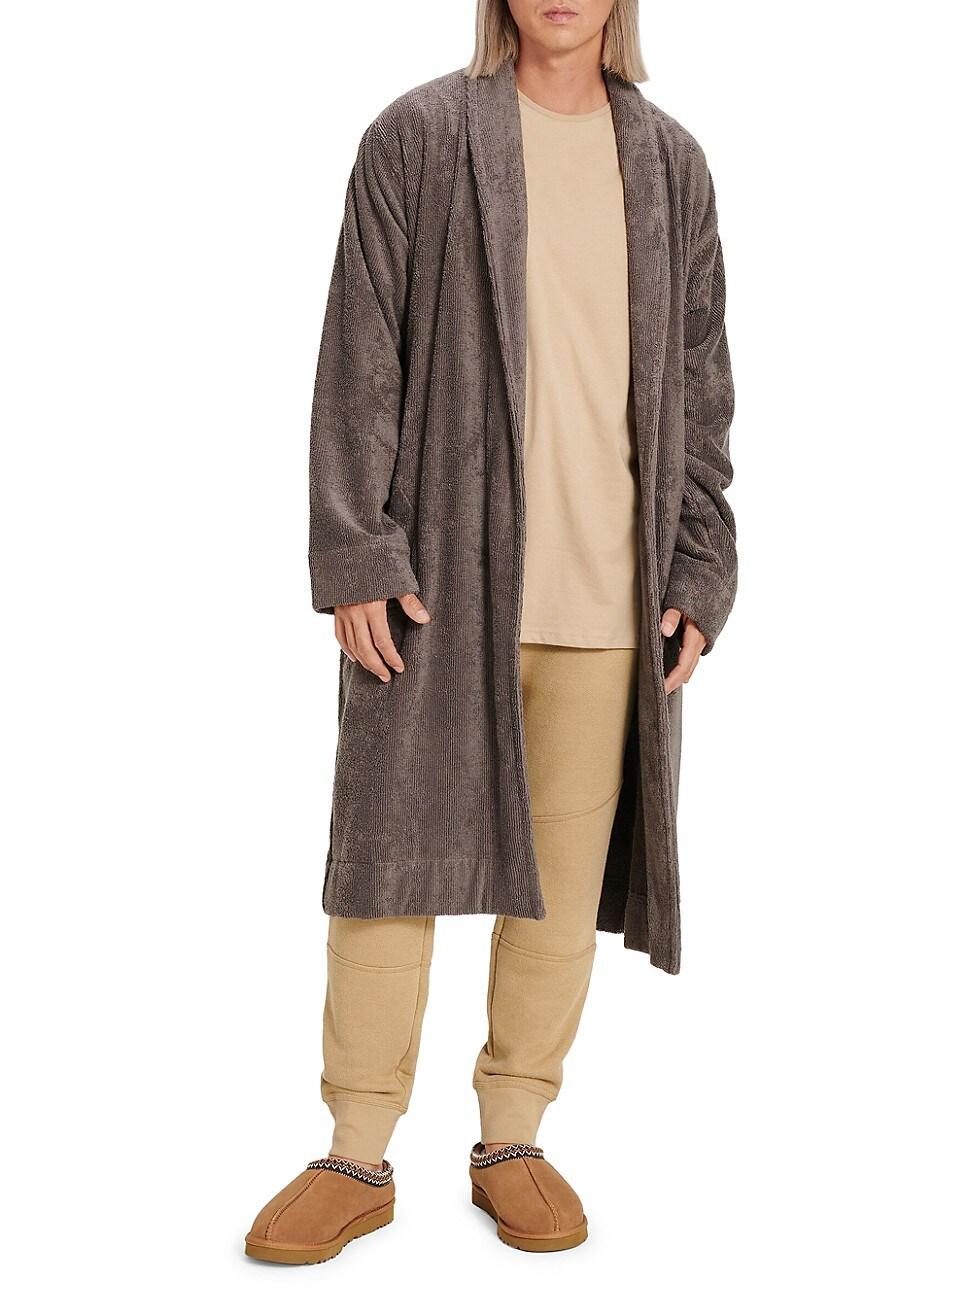 Ugg Men's Novelty Turner Terry Robe In Dark Grey